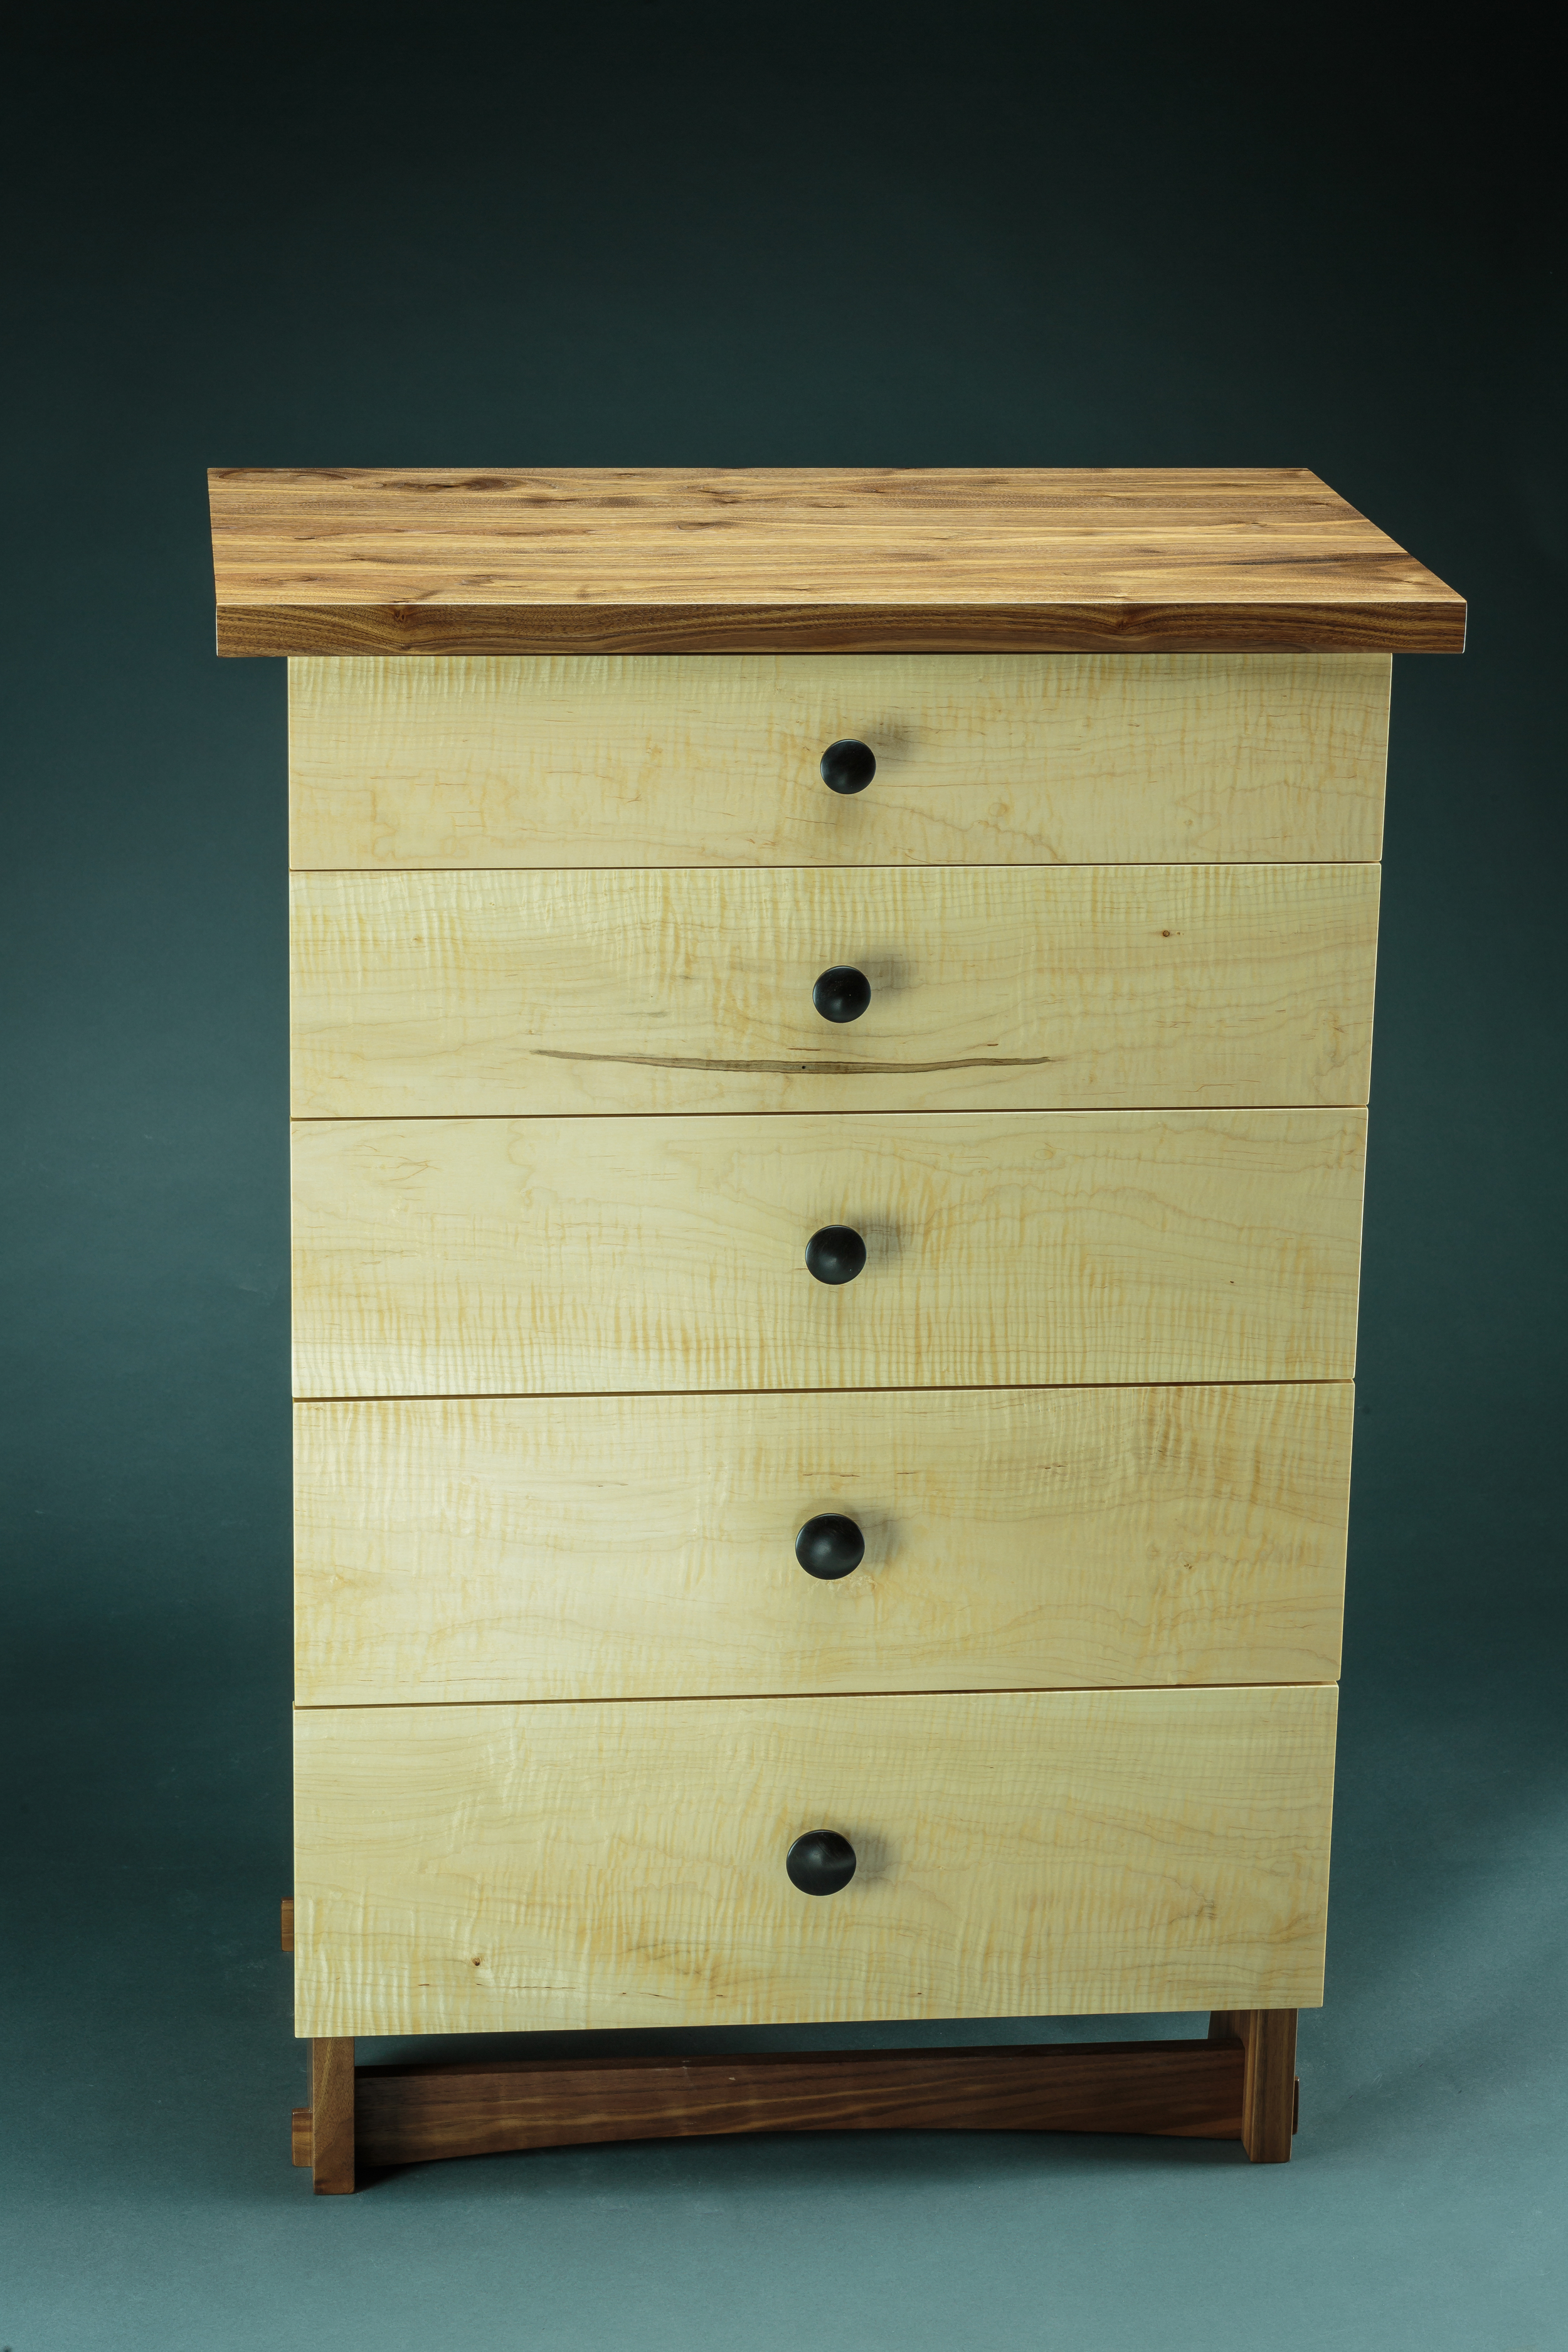 85 lb. dresser